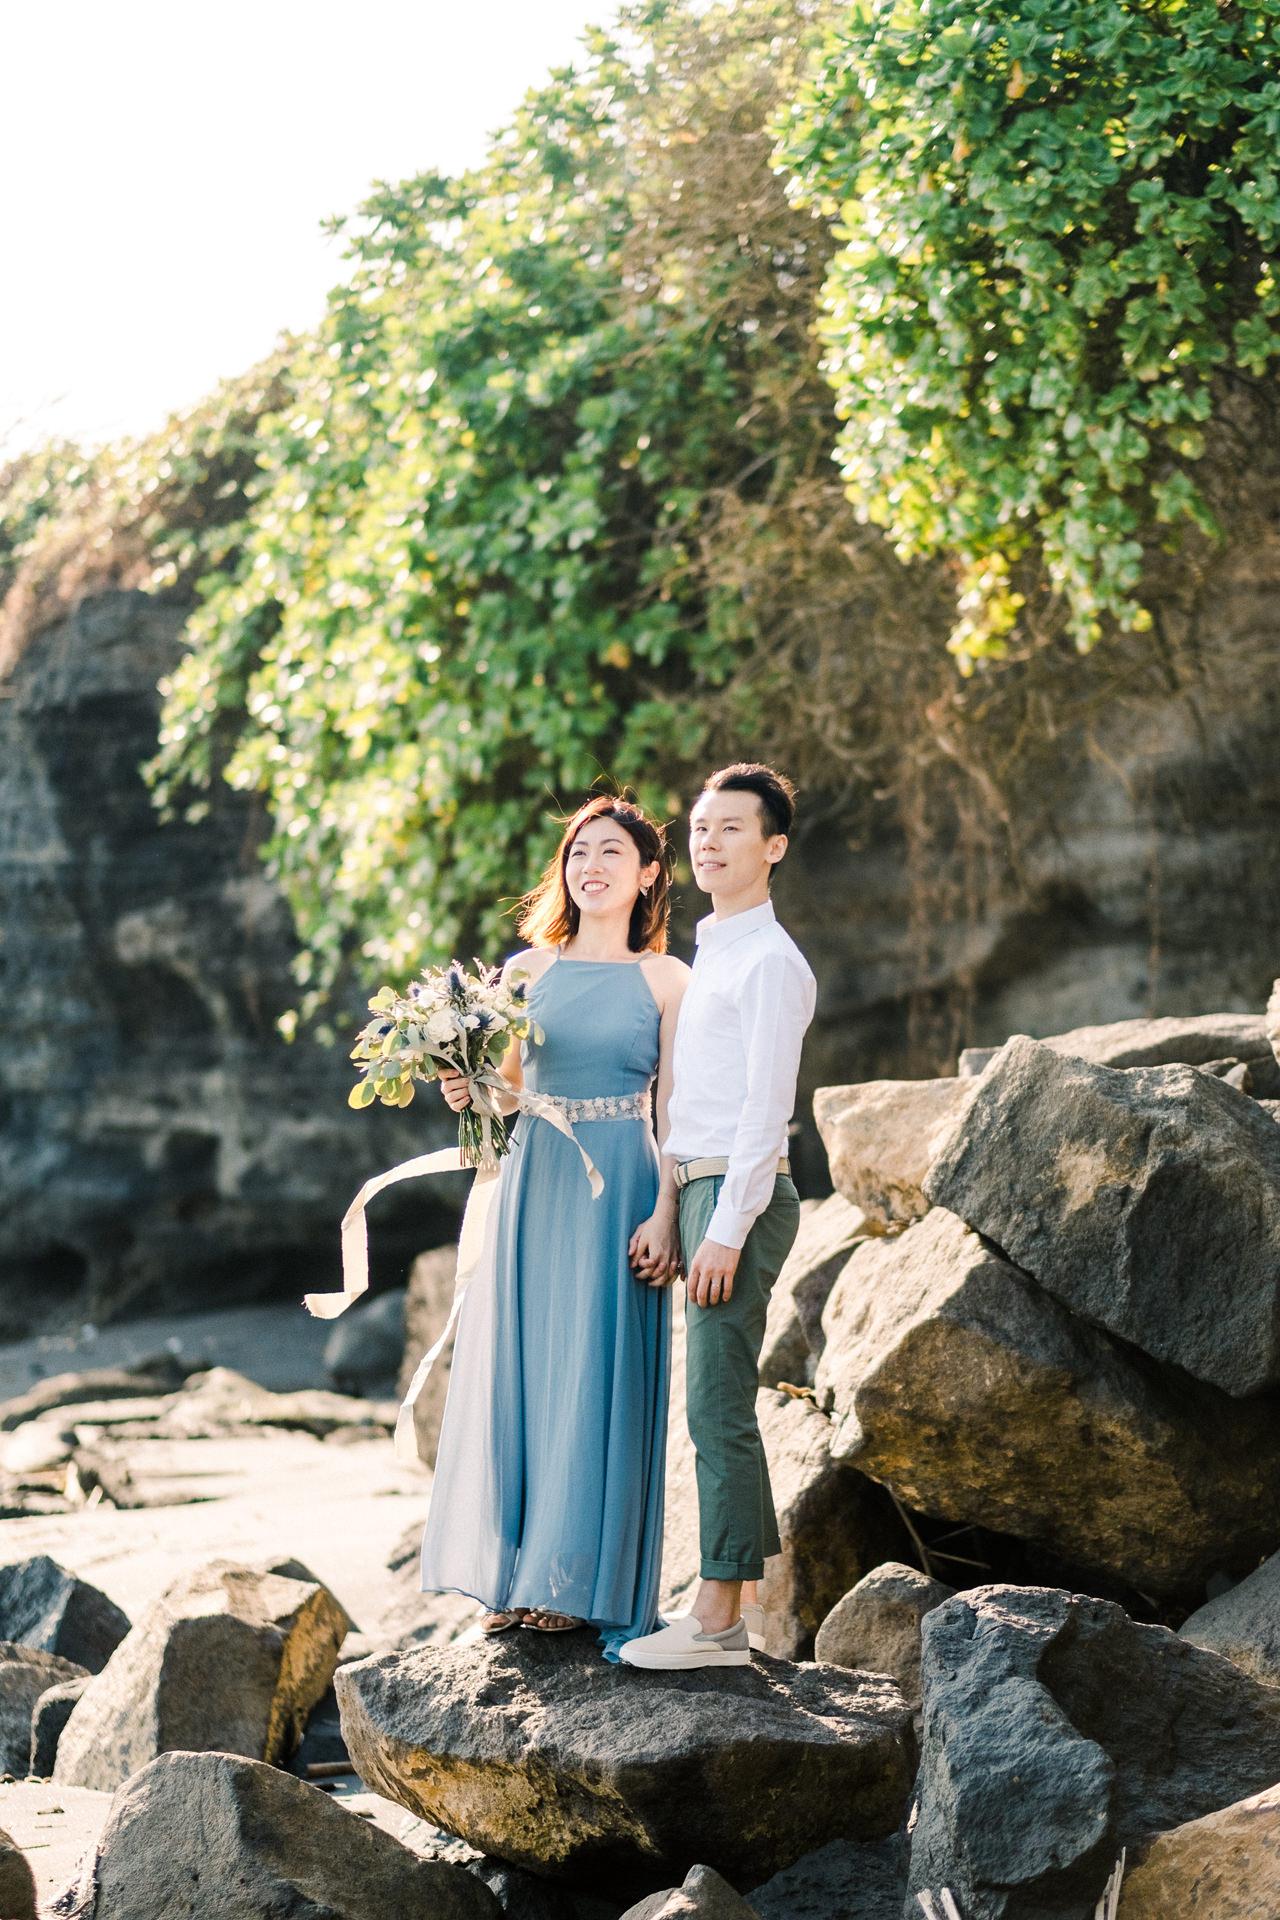 E&P: Sunset in Canggu Bali Engagement Photography 1